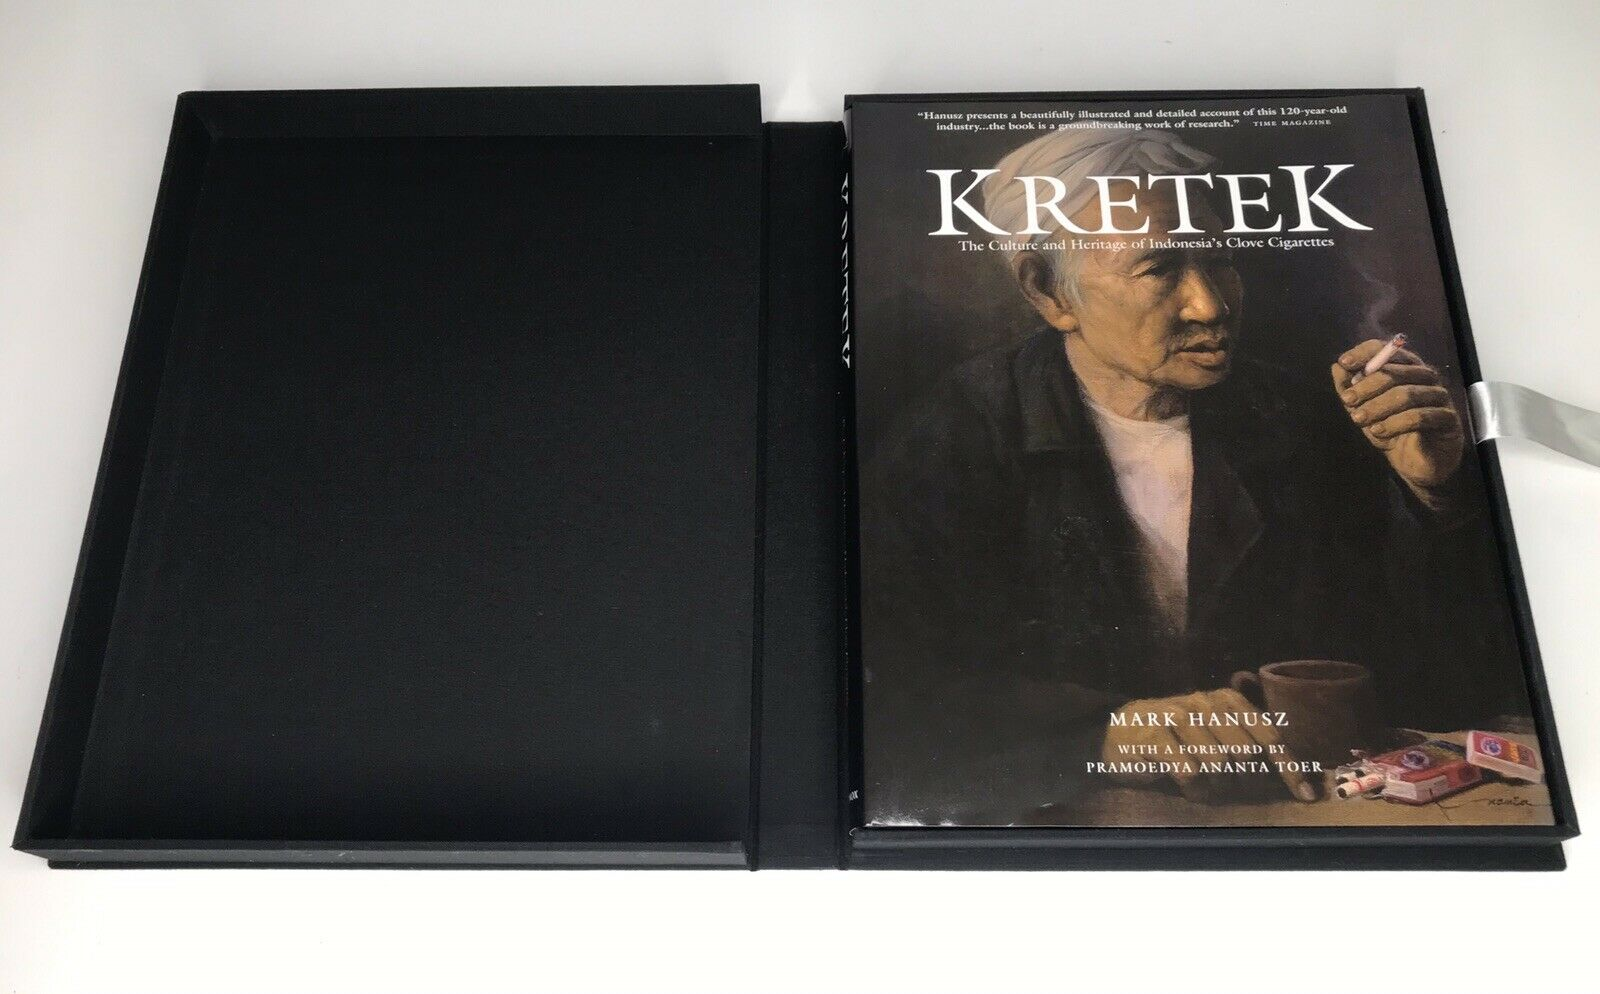 Kretek Book